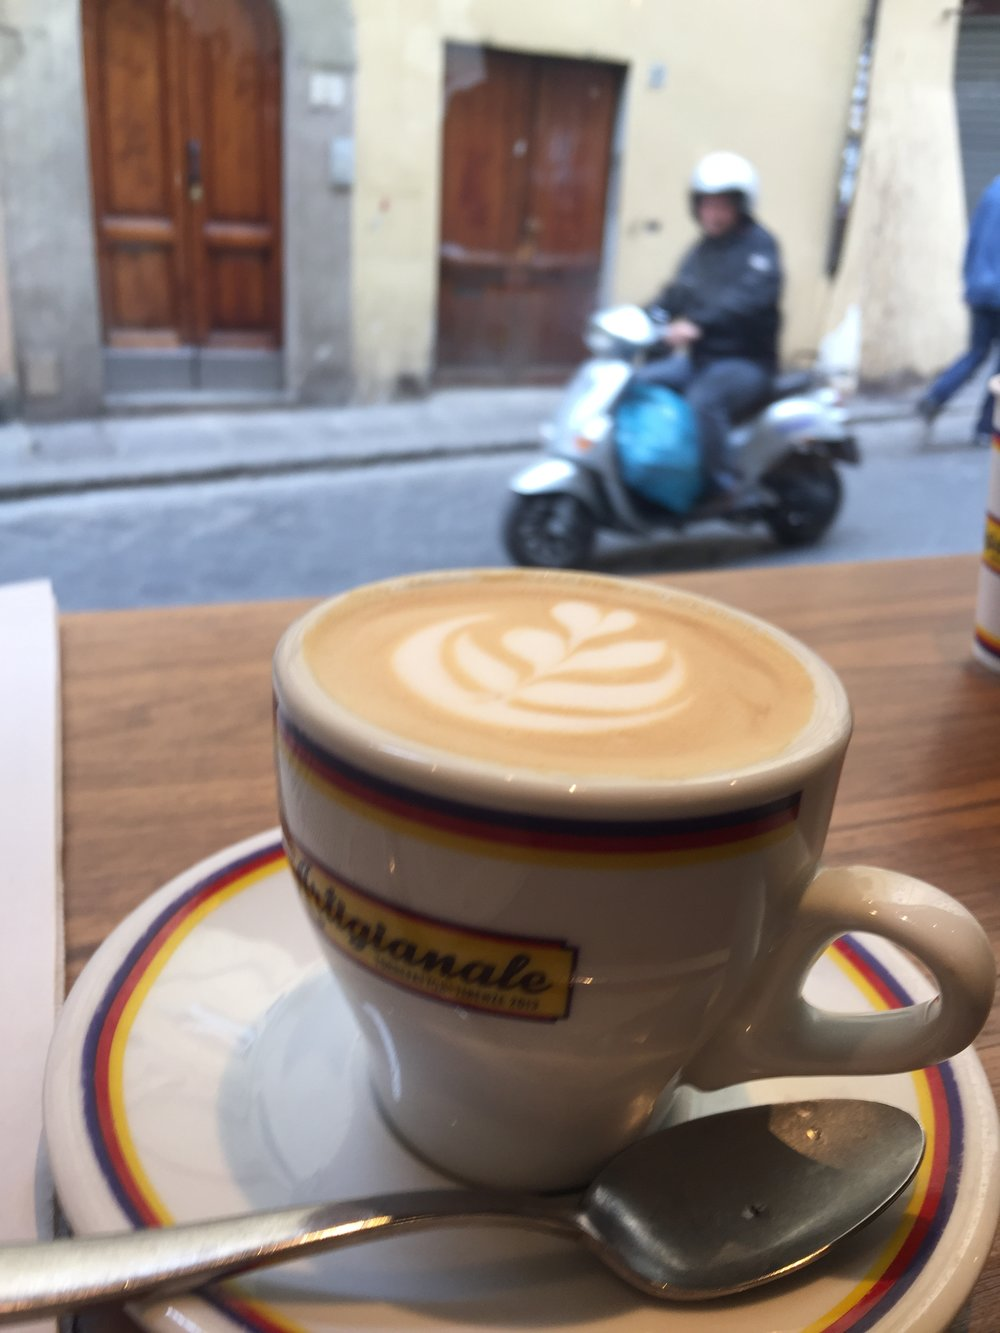 Espresso people watching